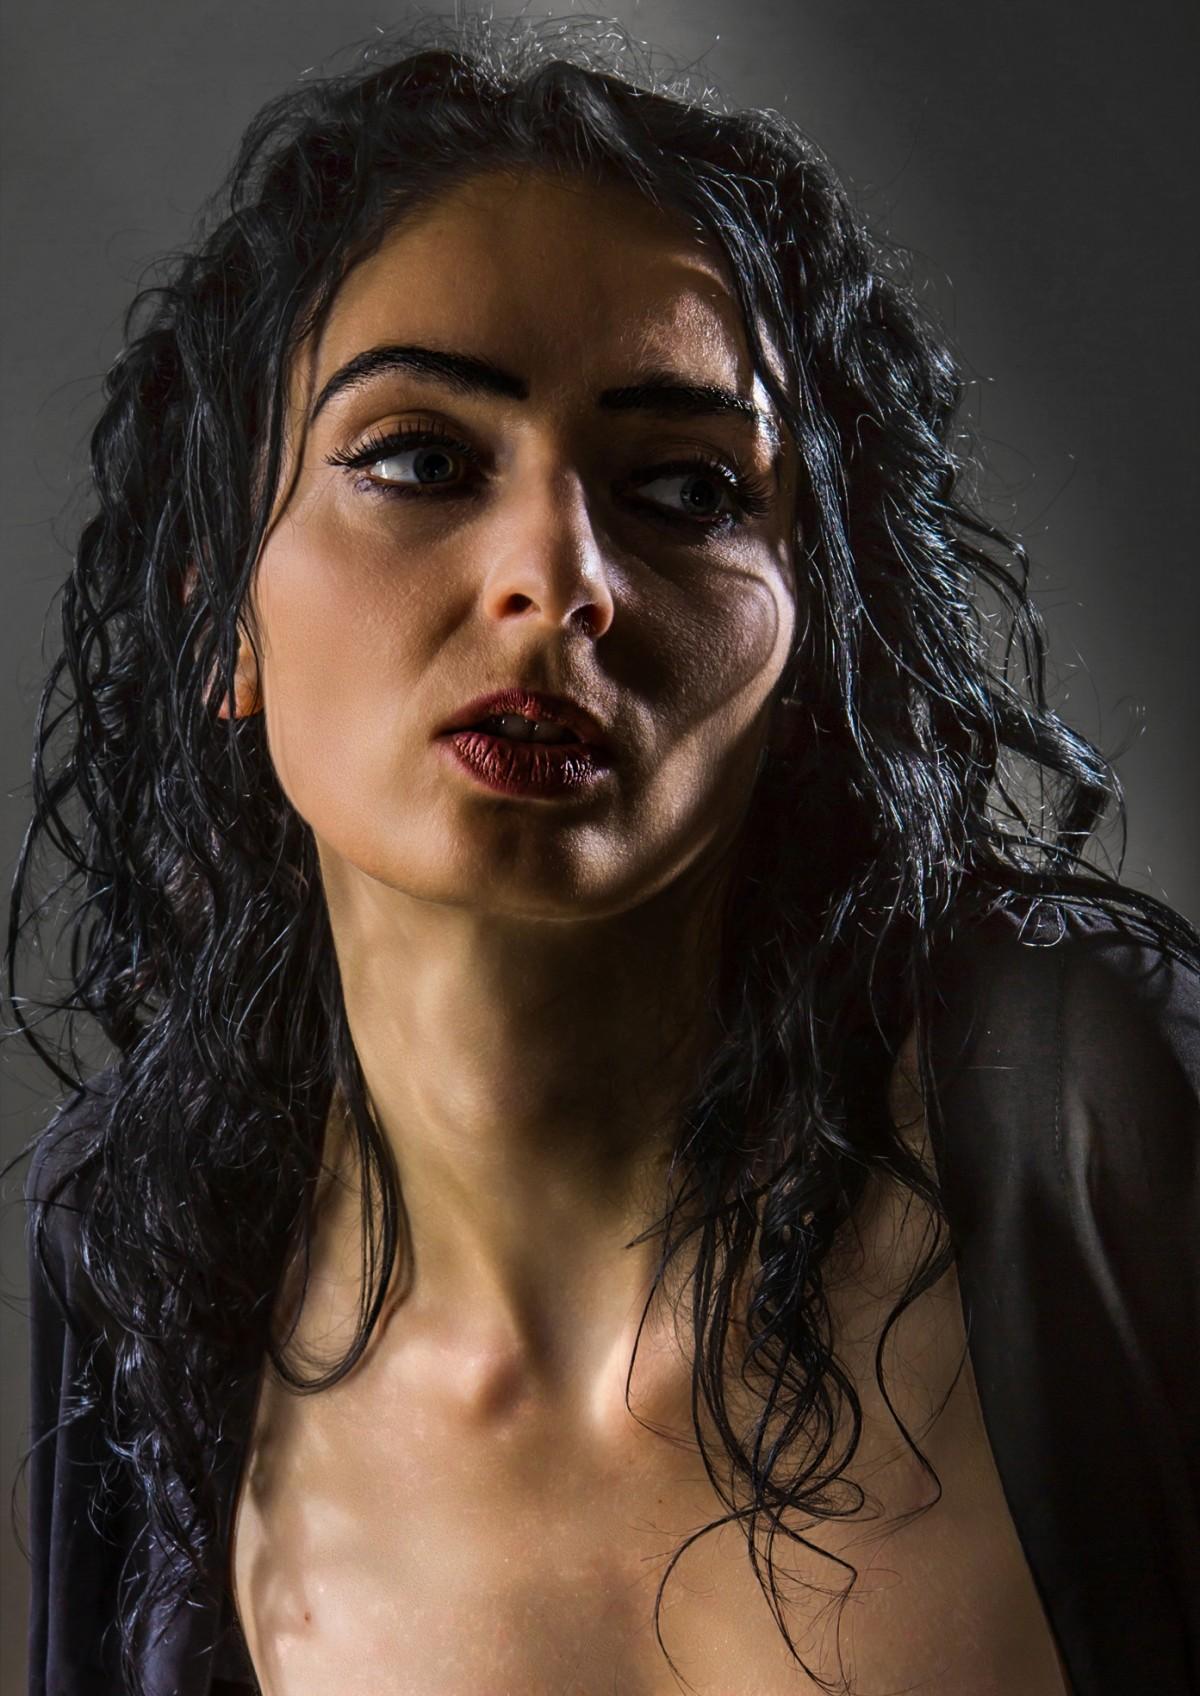 Free Images  Person, Girl, Female, Singer, Studio, Human -8080